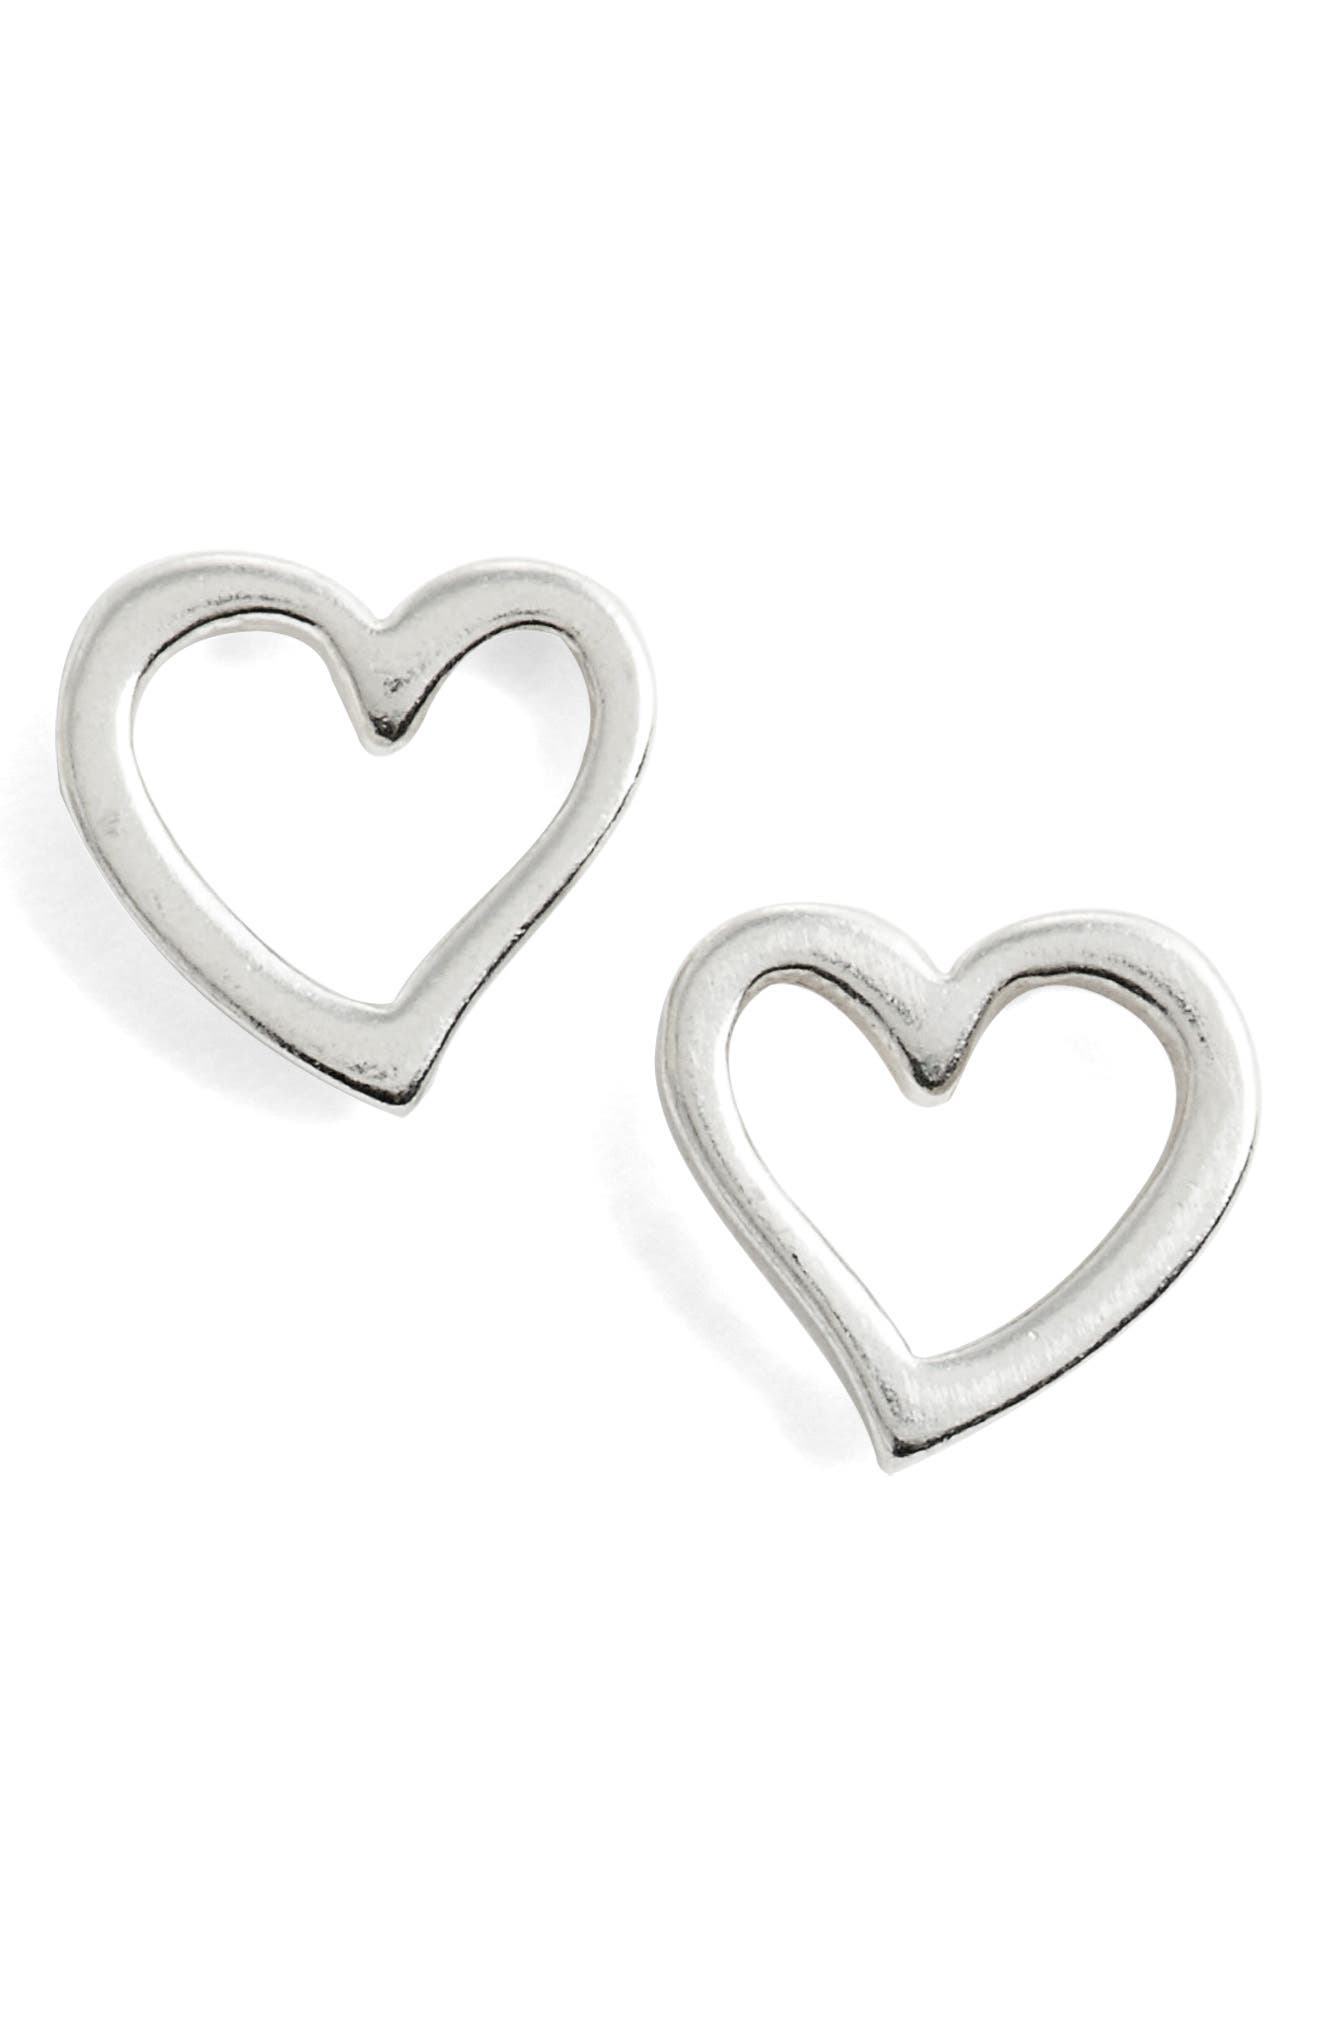 Heart Earrings,                         Main,                         color, Silver